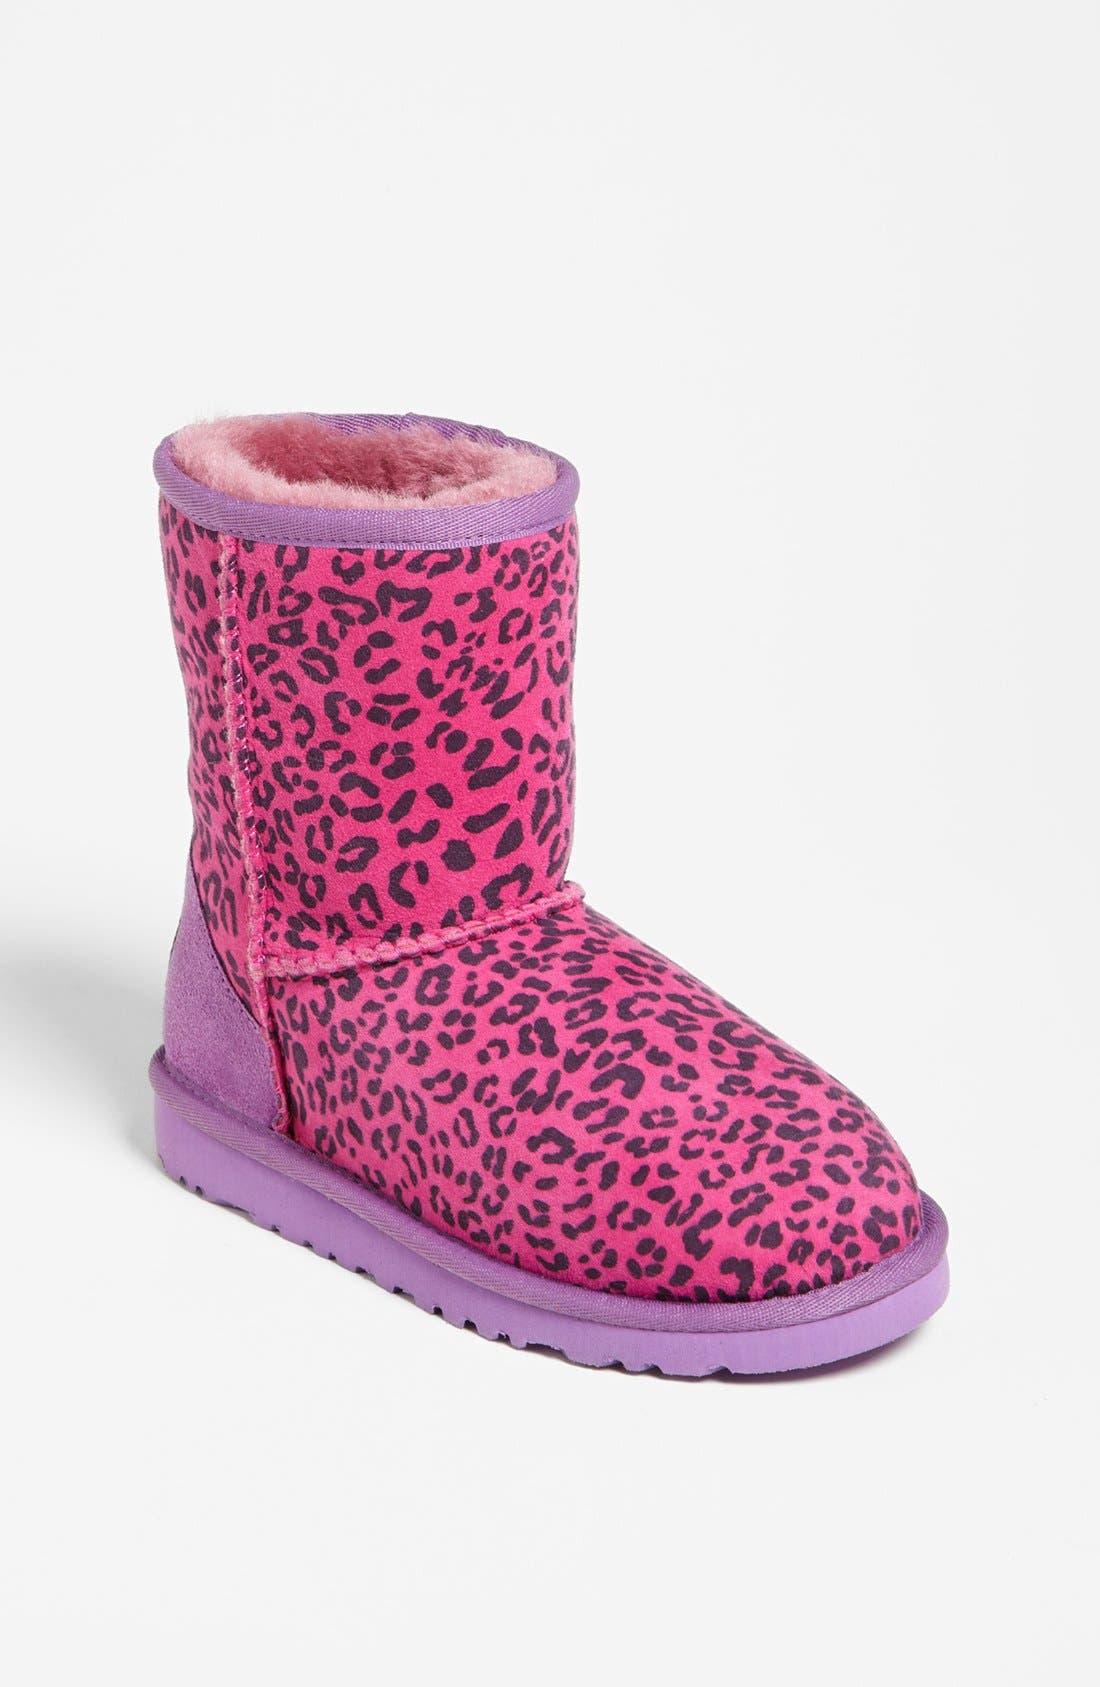 Main Image - UGG® Australia Leopard Print Short Boot (Walker, Toddler, Little Kid & Big Kid)(Nordstrom Exclusive)